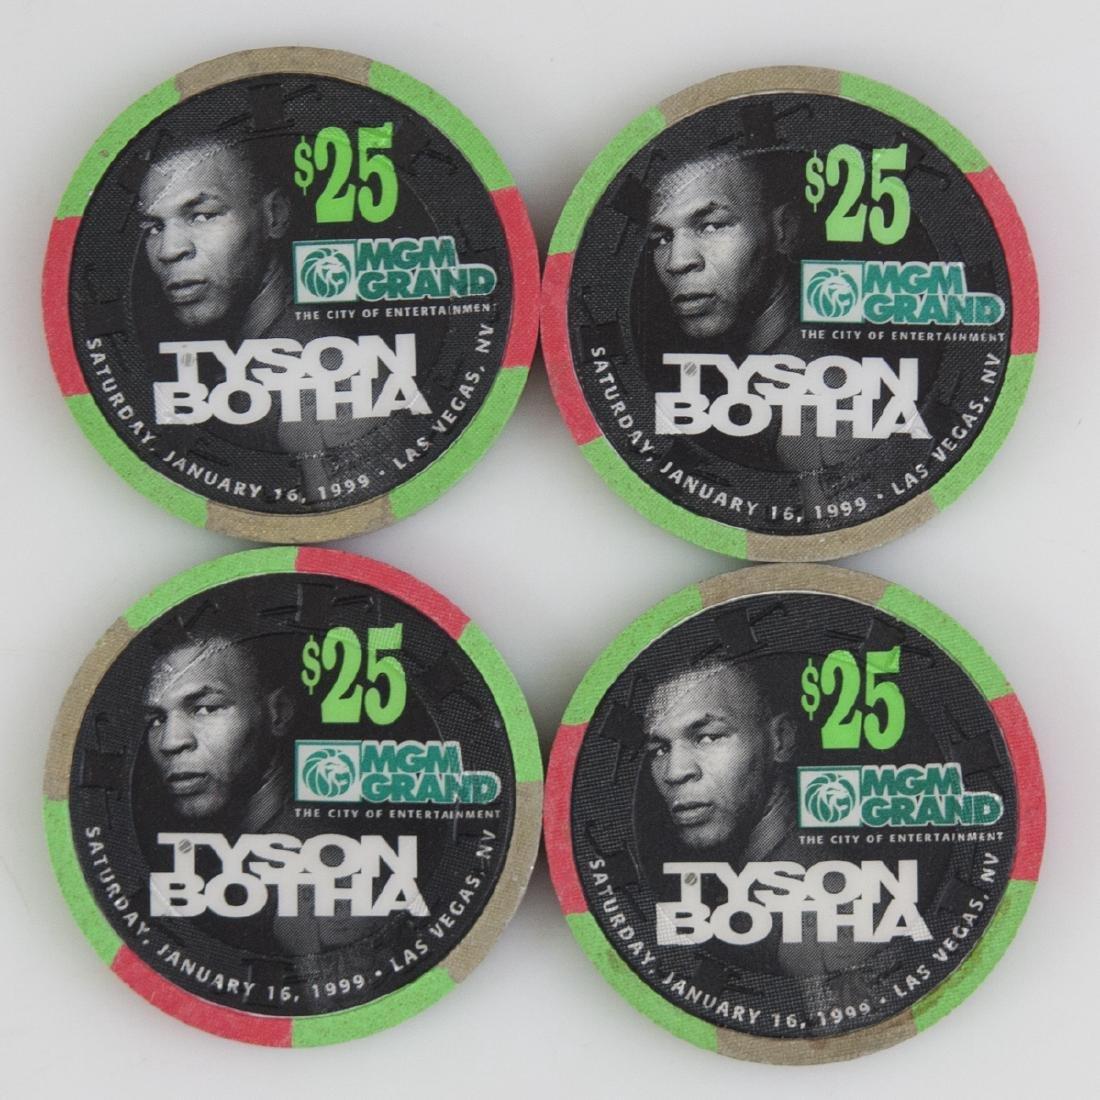 "MGM Grand 1999 ""Tyson Botha"" Chips - 2"